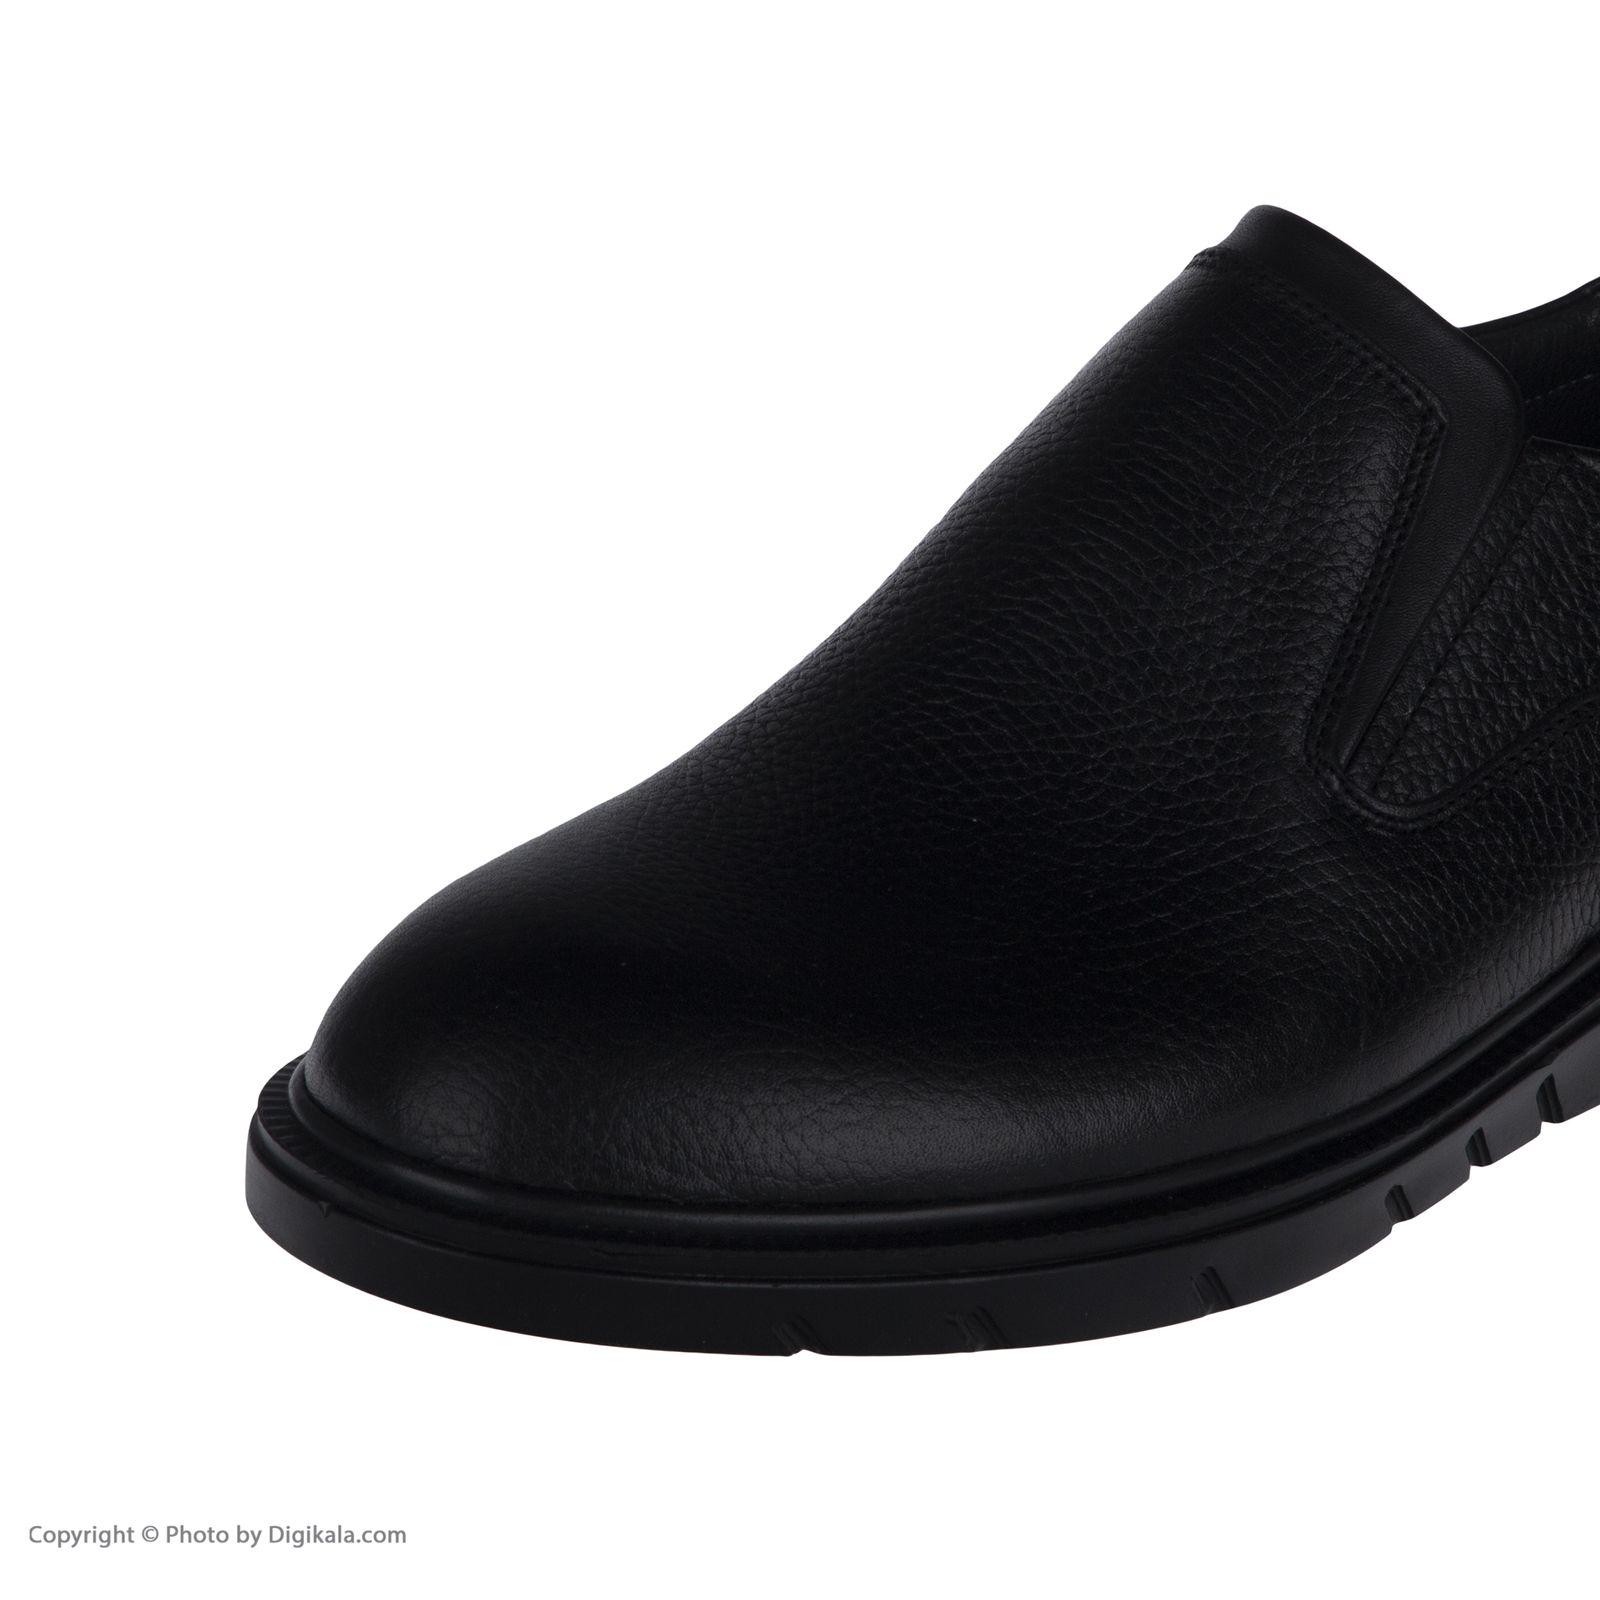 کفش روزمره مردانه بلوط مدل 7240C503101 -  - 8